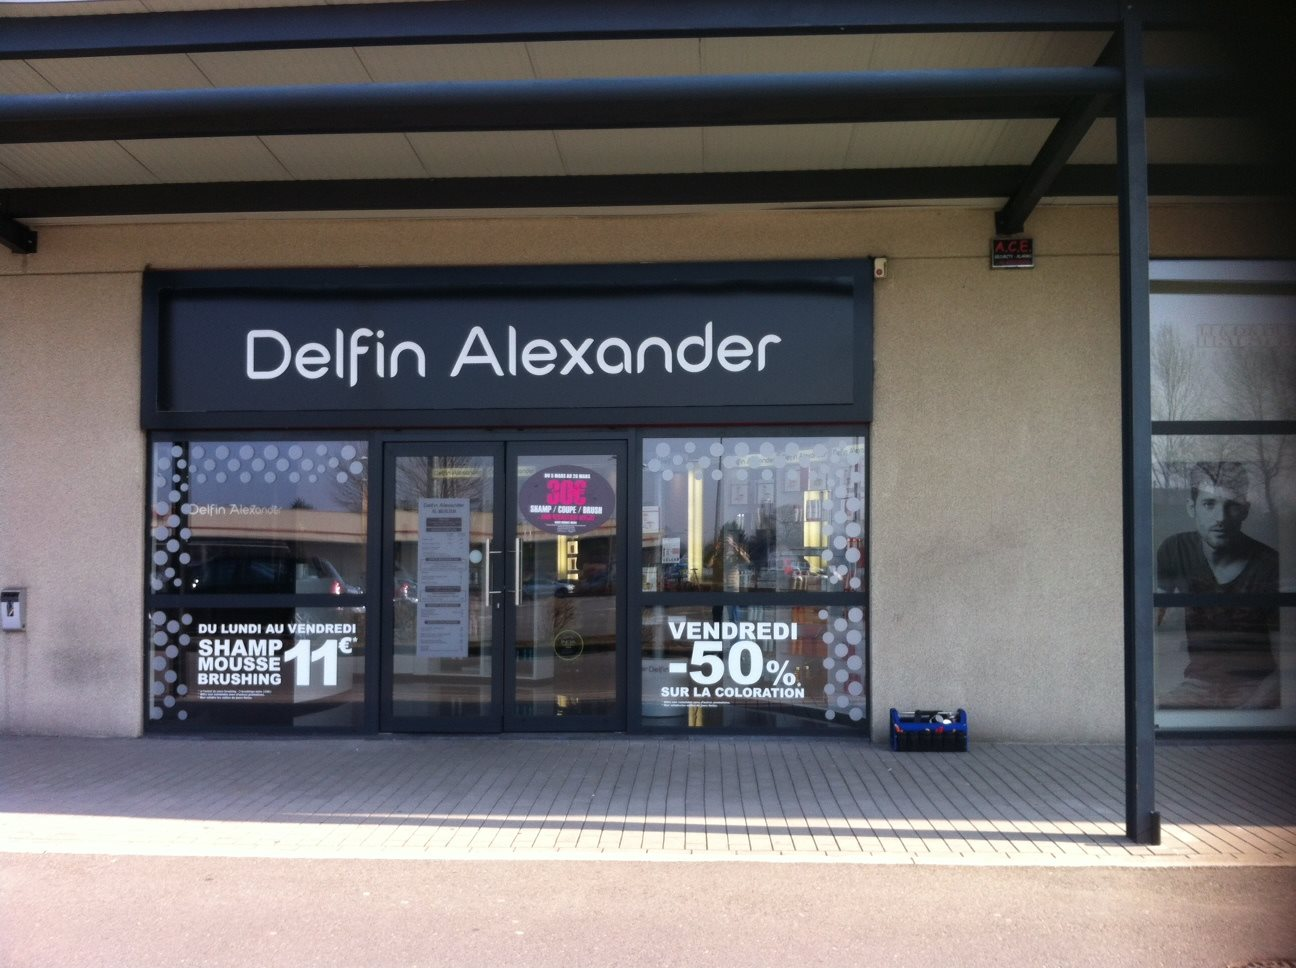 Salon de coiffure delfin alexander maisi res flyers for Porte revue salon de coiffure